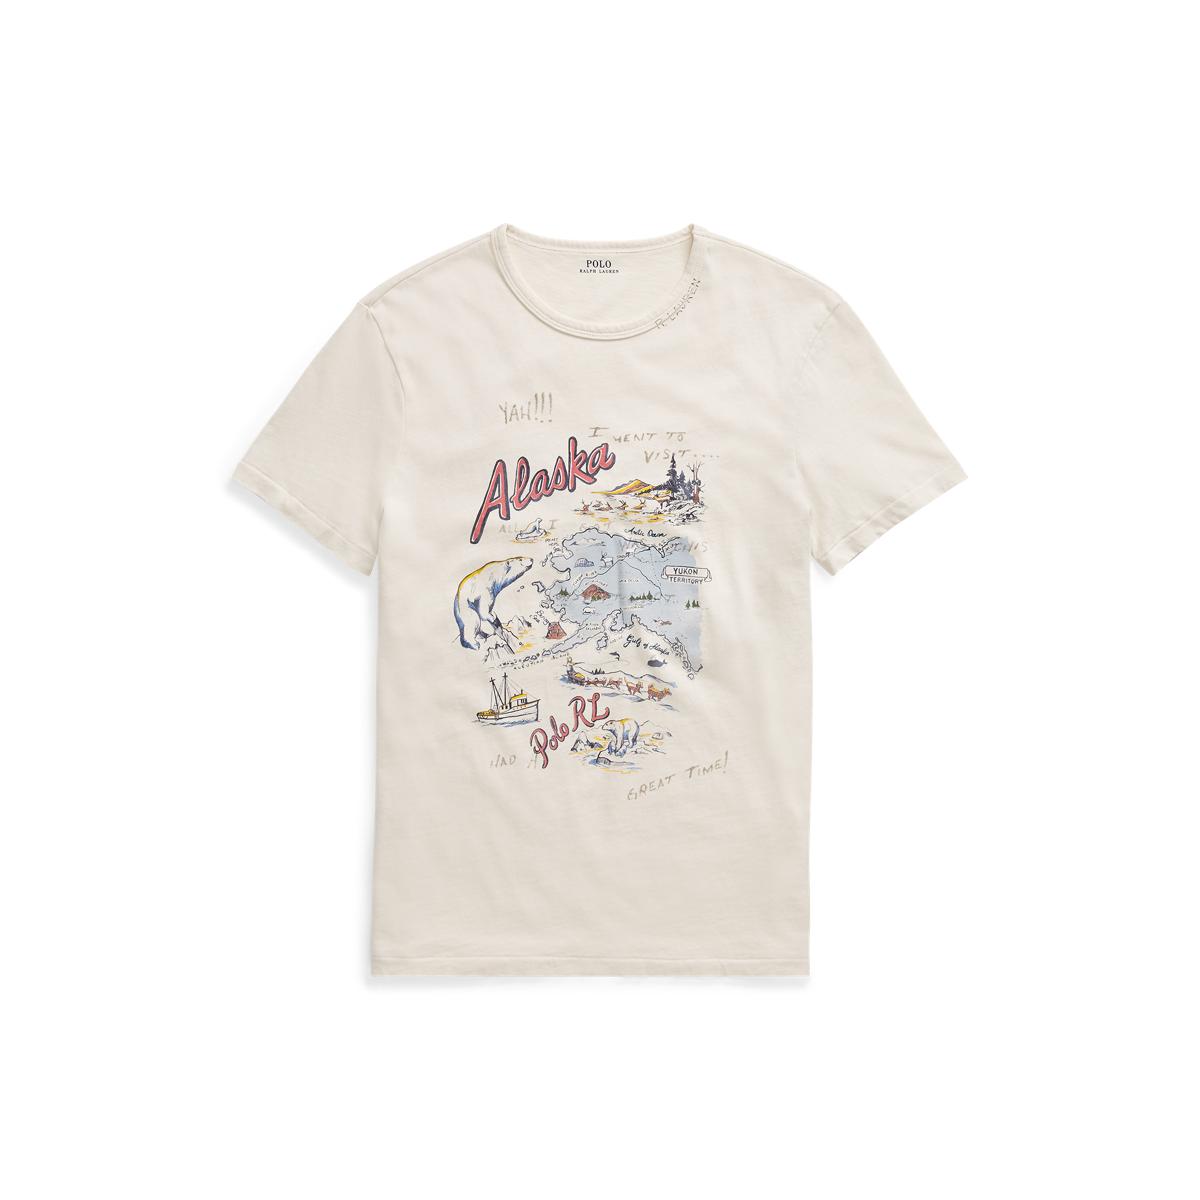 Ralph Lauren Men/'s POLORL Shirt Number 3 Custom Slim Fit White Size M